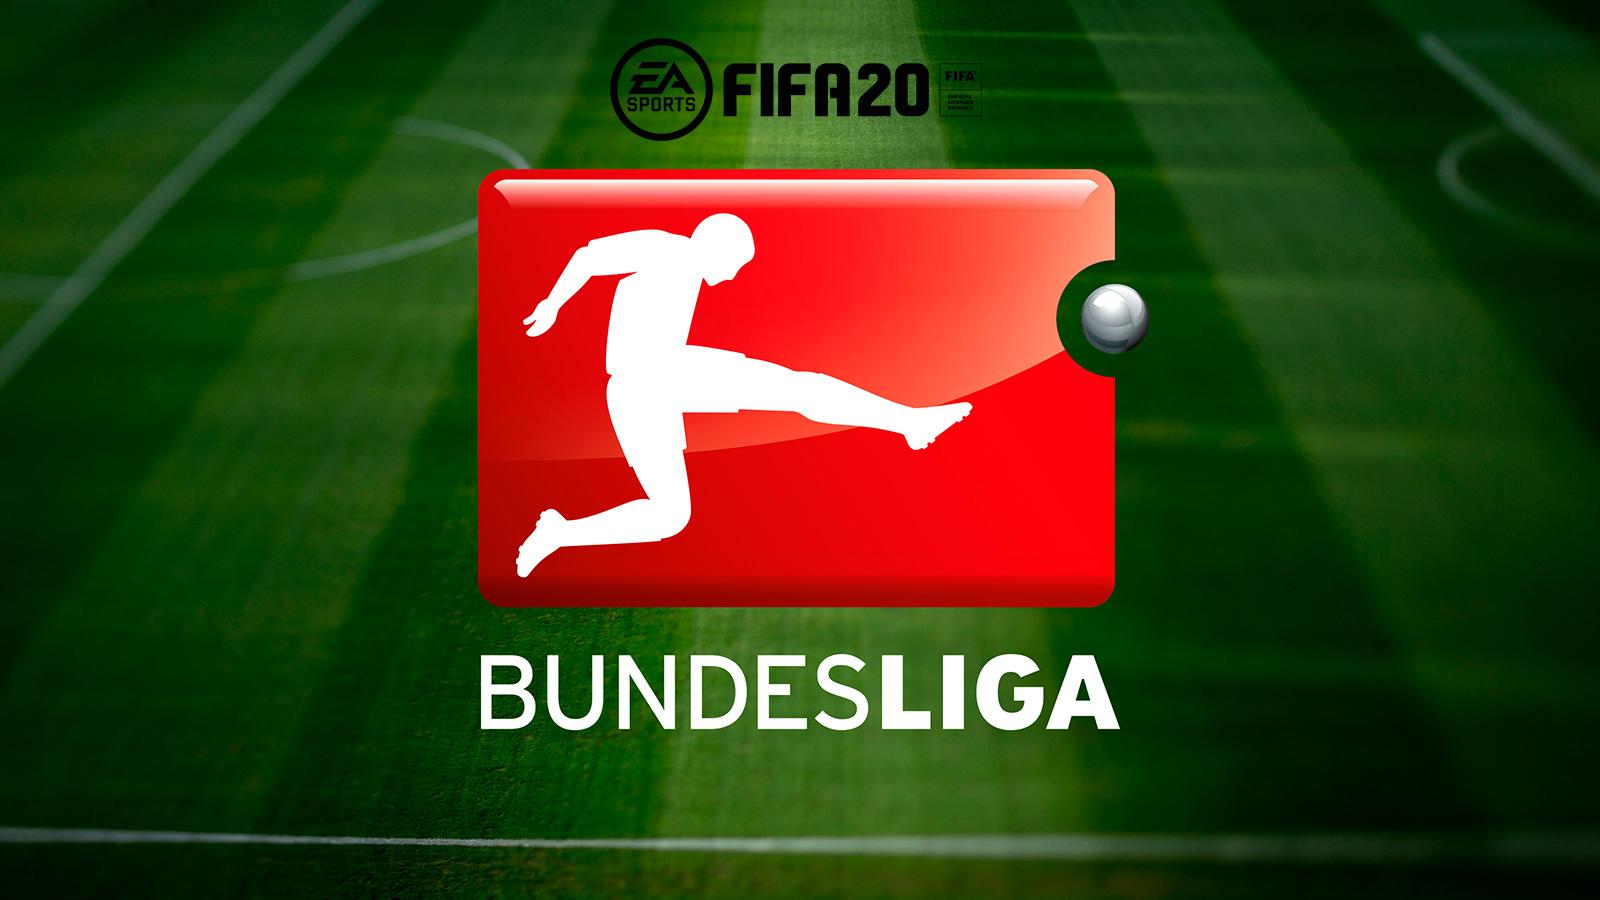 Bundesliga / EA Sports